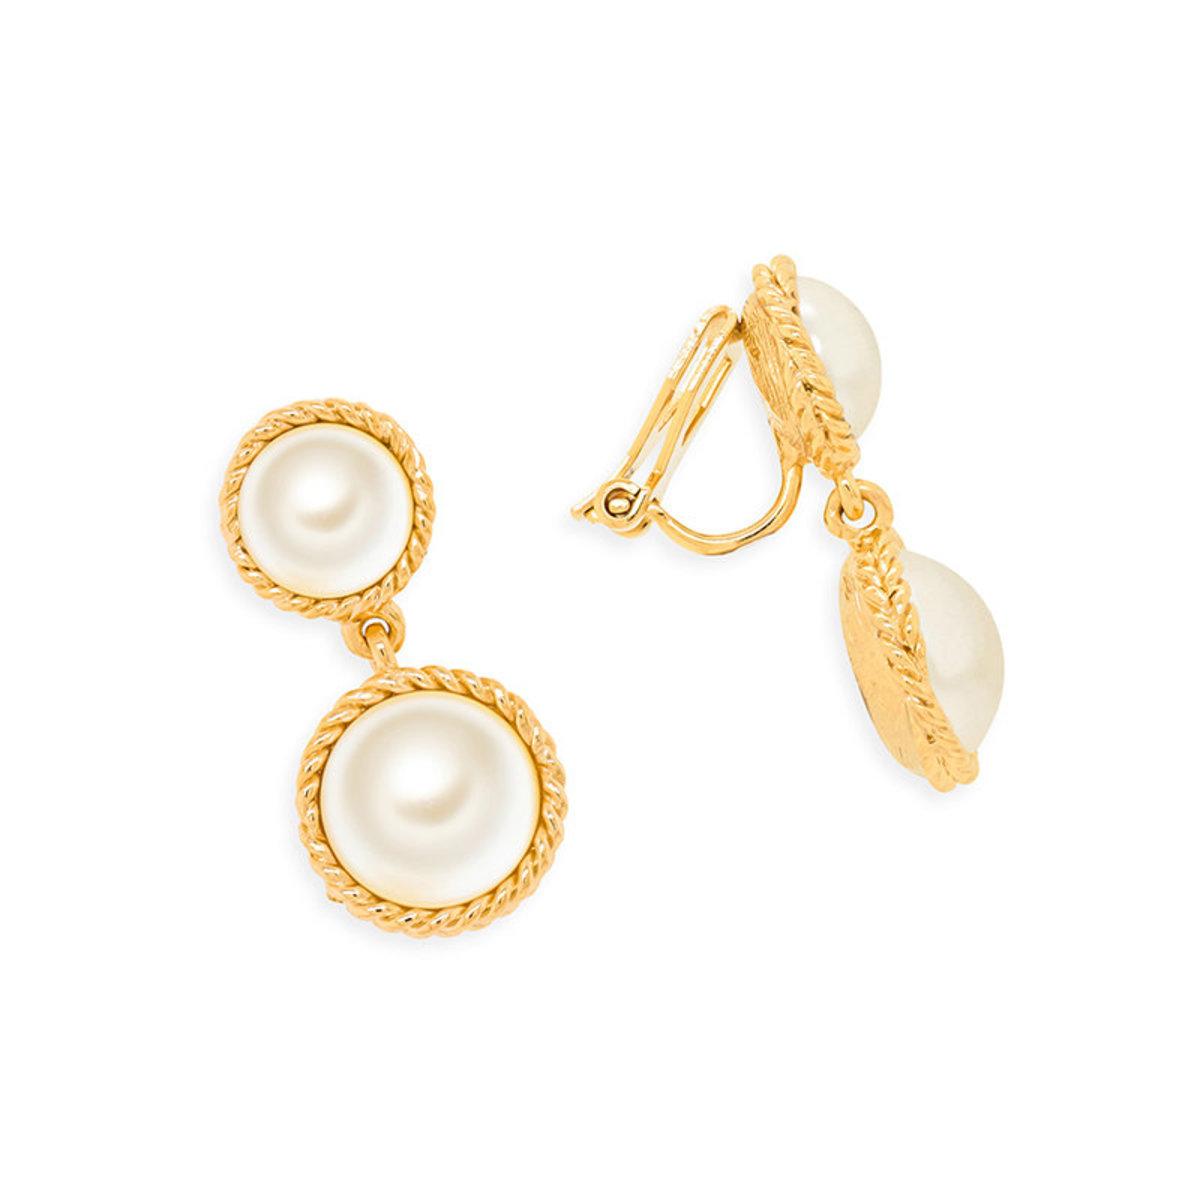 Statement Pearl: gold plating, Swarovski pearl clip earrings